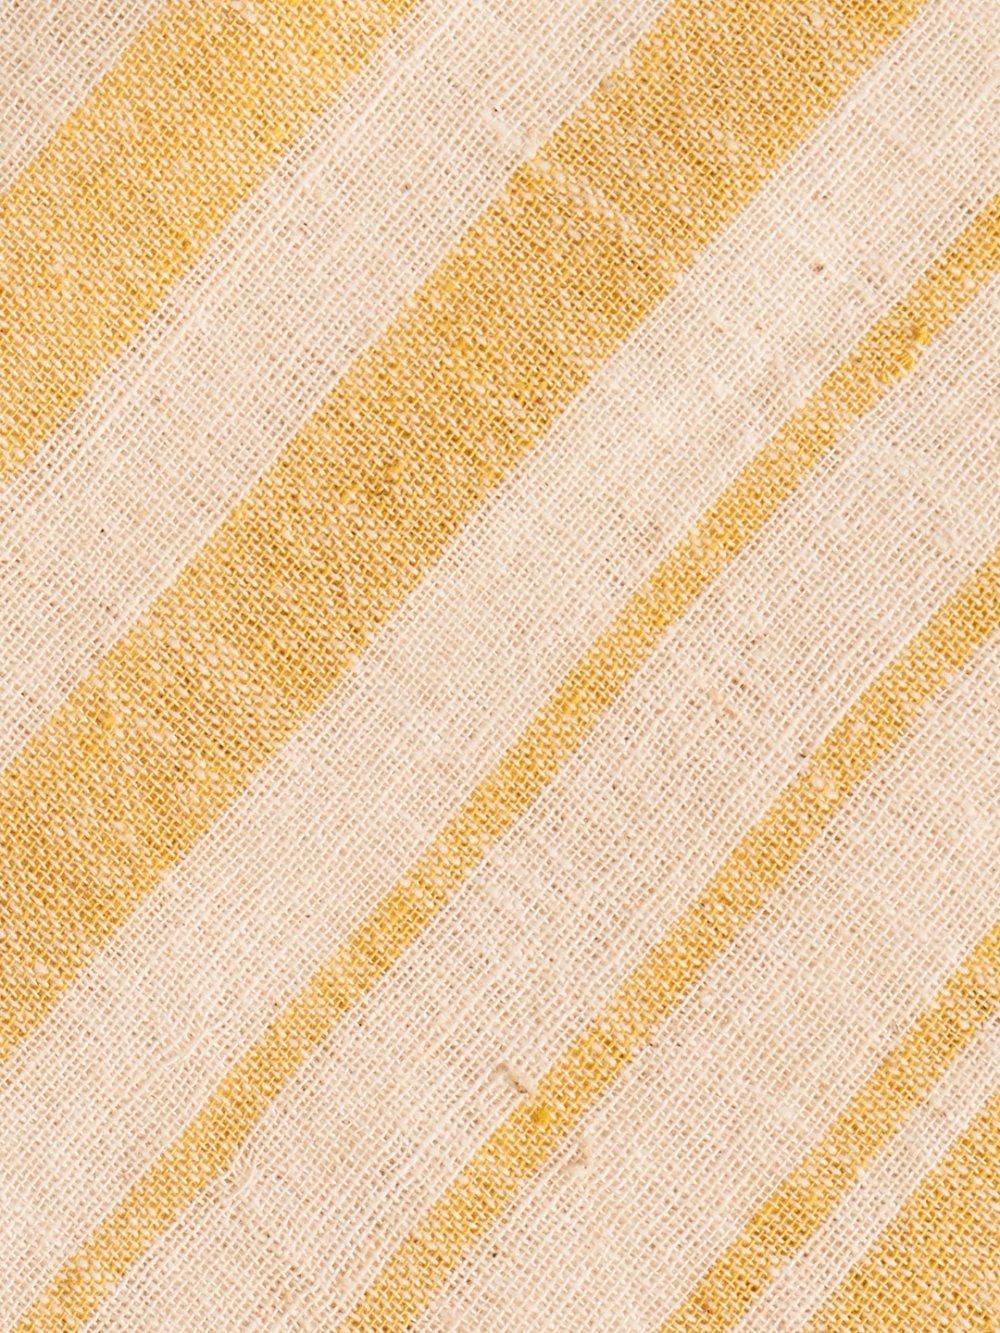 patrah.com Organic Clothing Texture